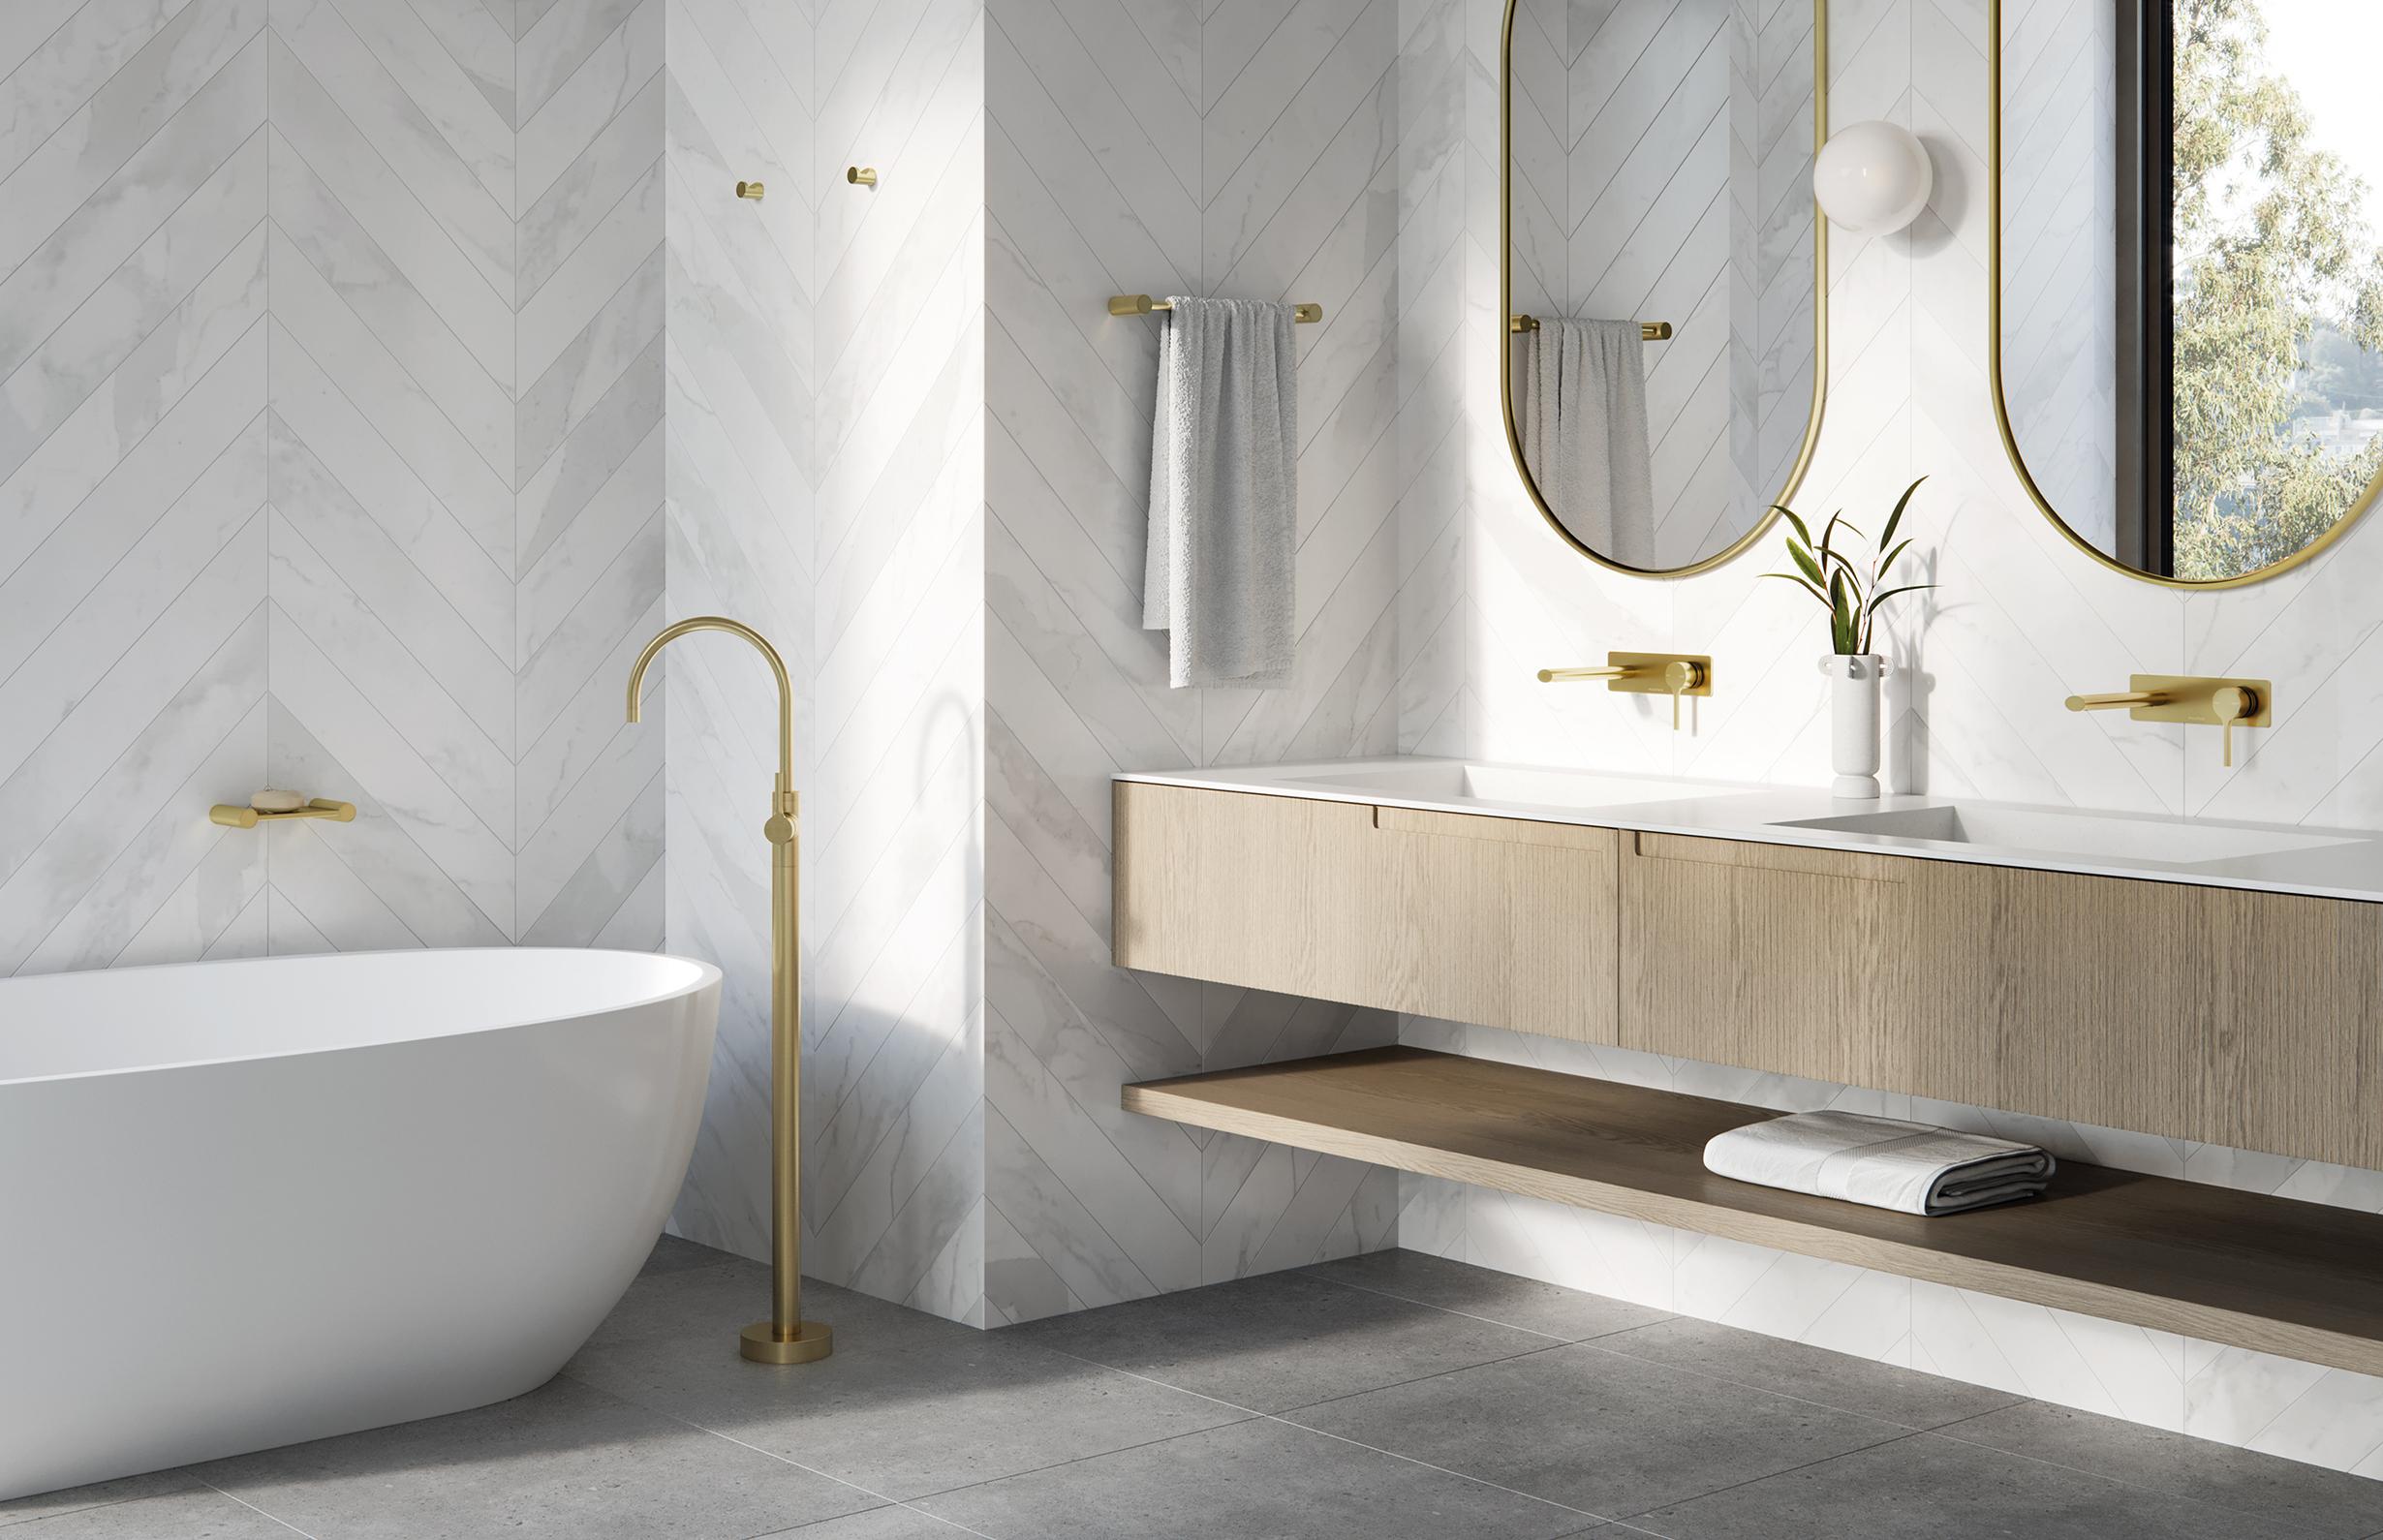 phoenix-tapware-vivid-slimline-brushed-gold-tap.jpg